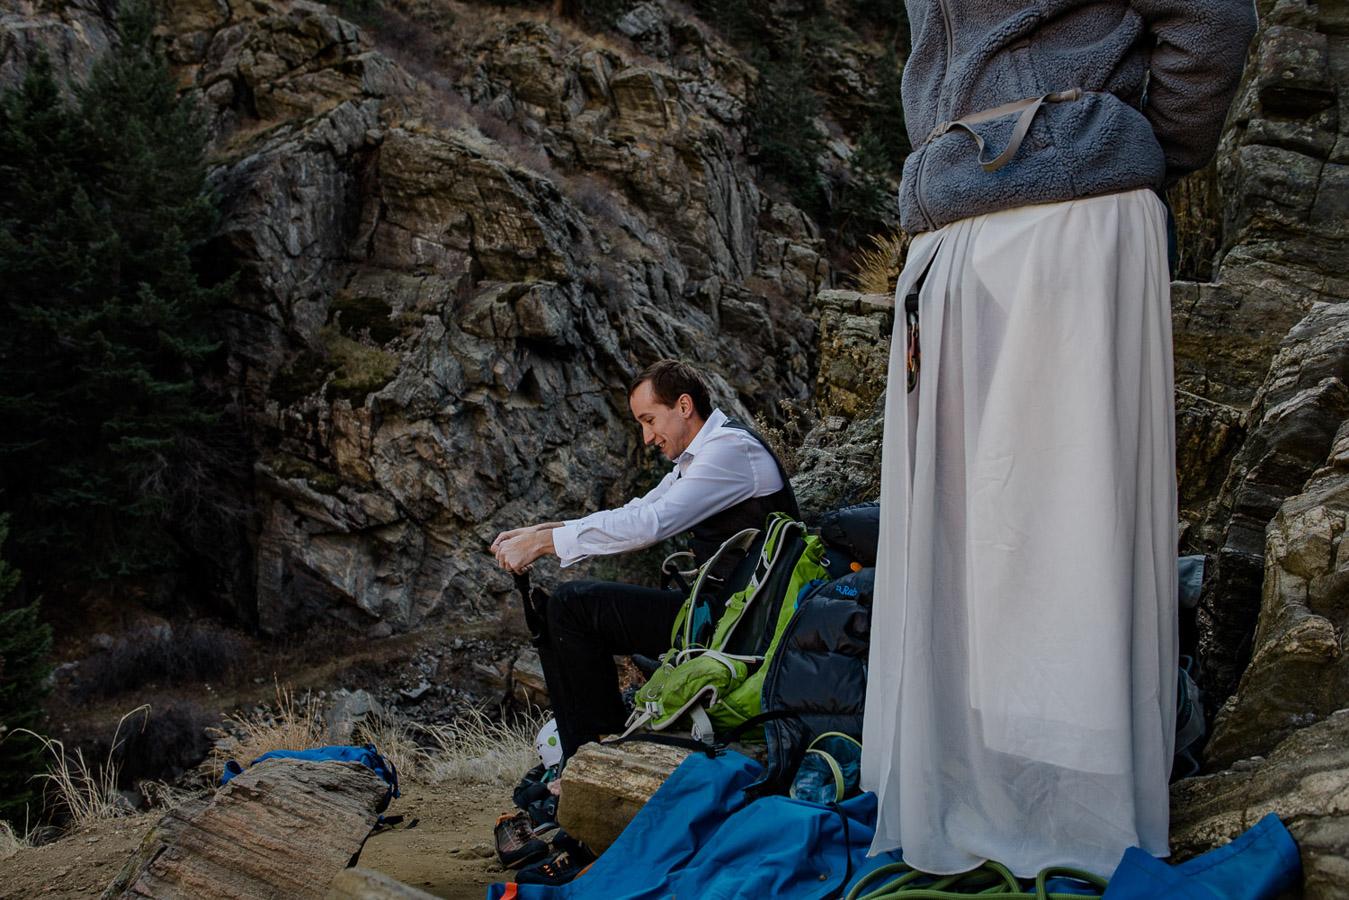 Rock Climbing Adventure Elopement {Lauren & Zak Adventurous Colorado Destination Elopement} | Clear Creek Canyon Capitalist Crag